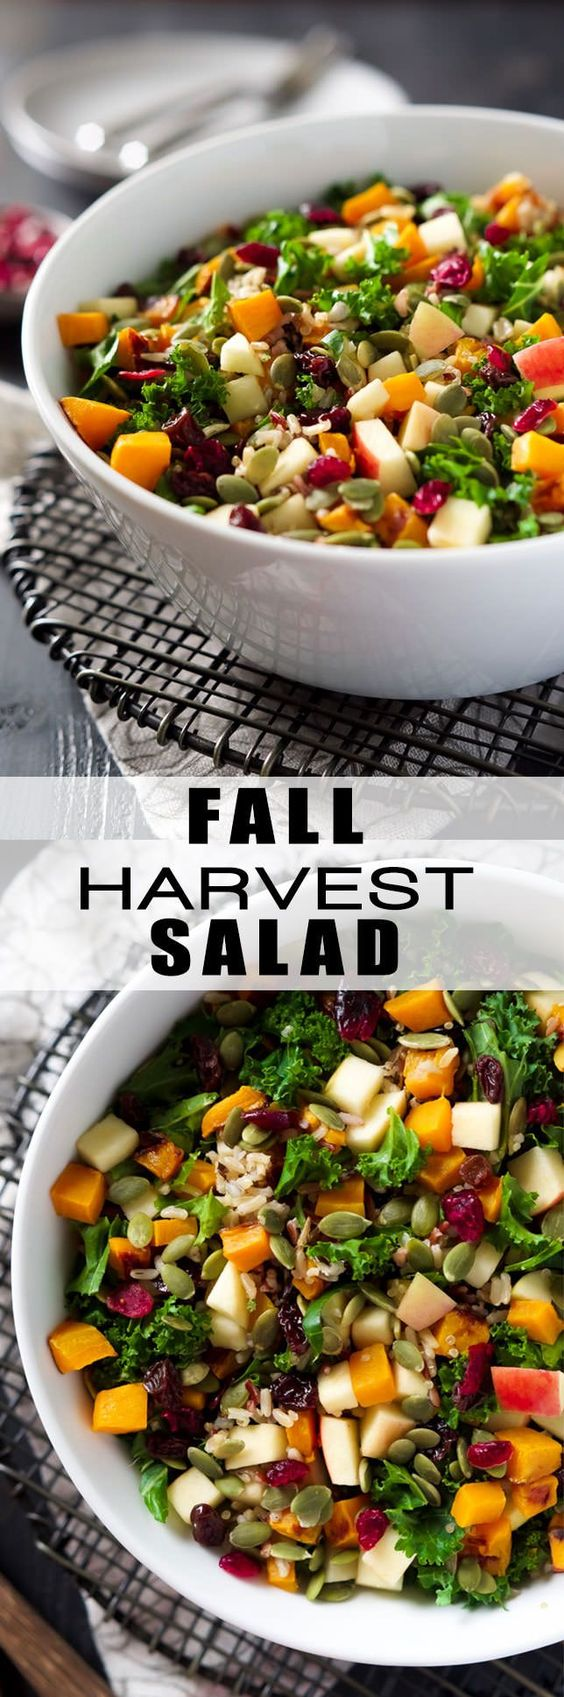 Salad Recipe | Butternut squash, apples, apple cider vinegar dressing ...